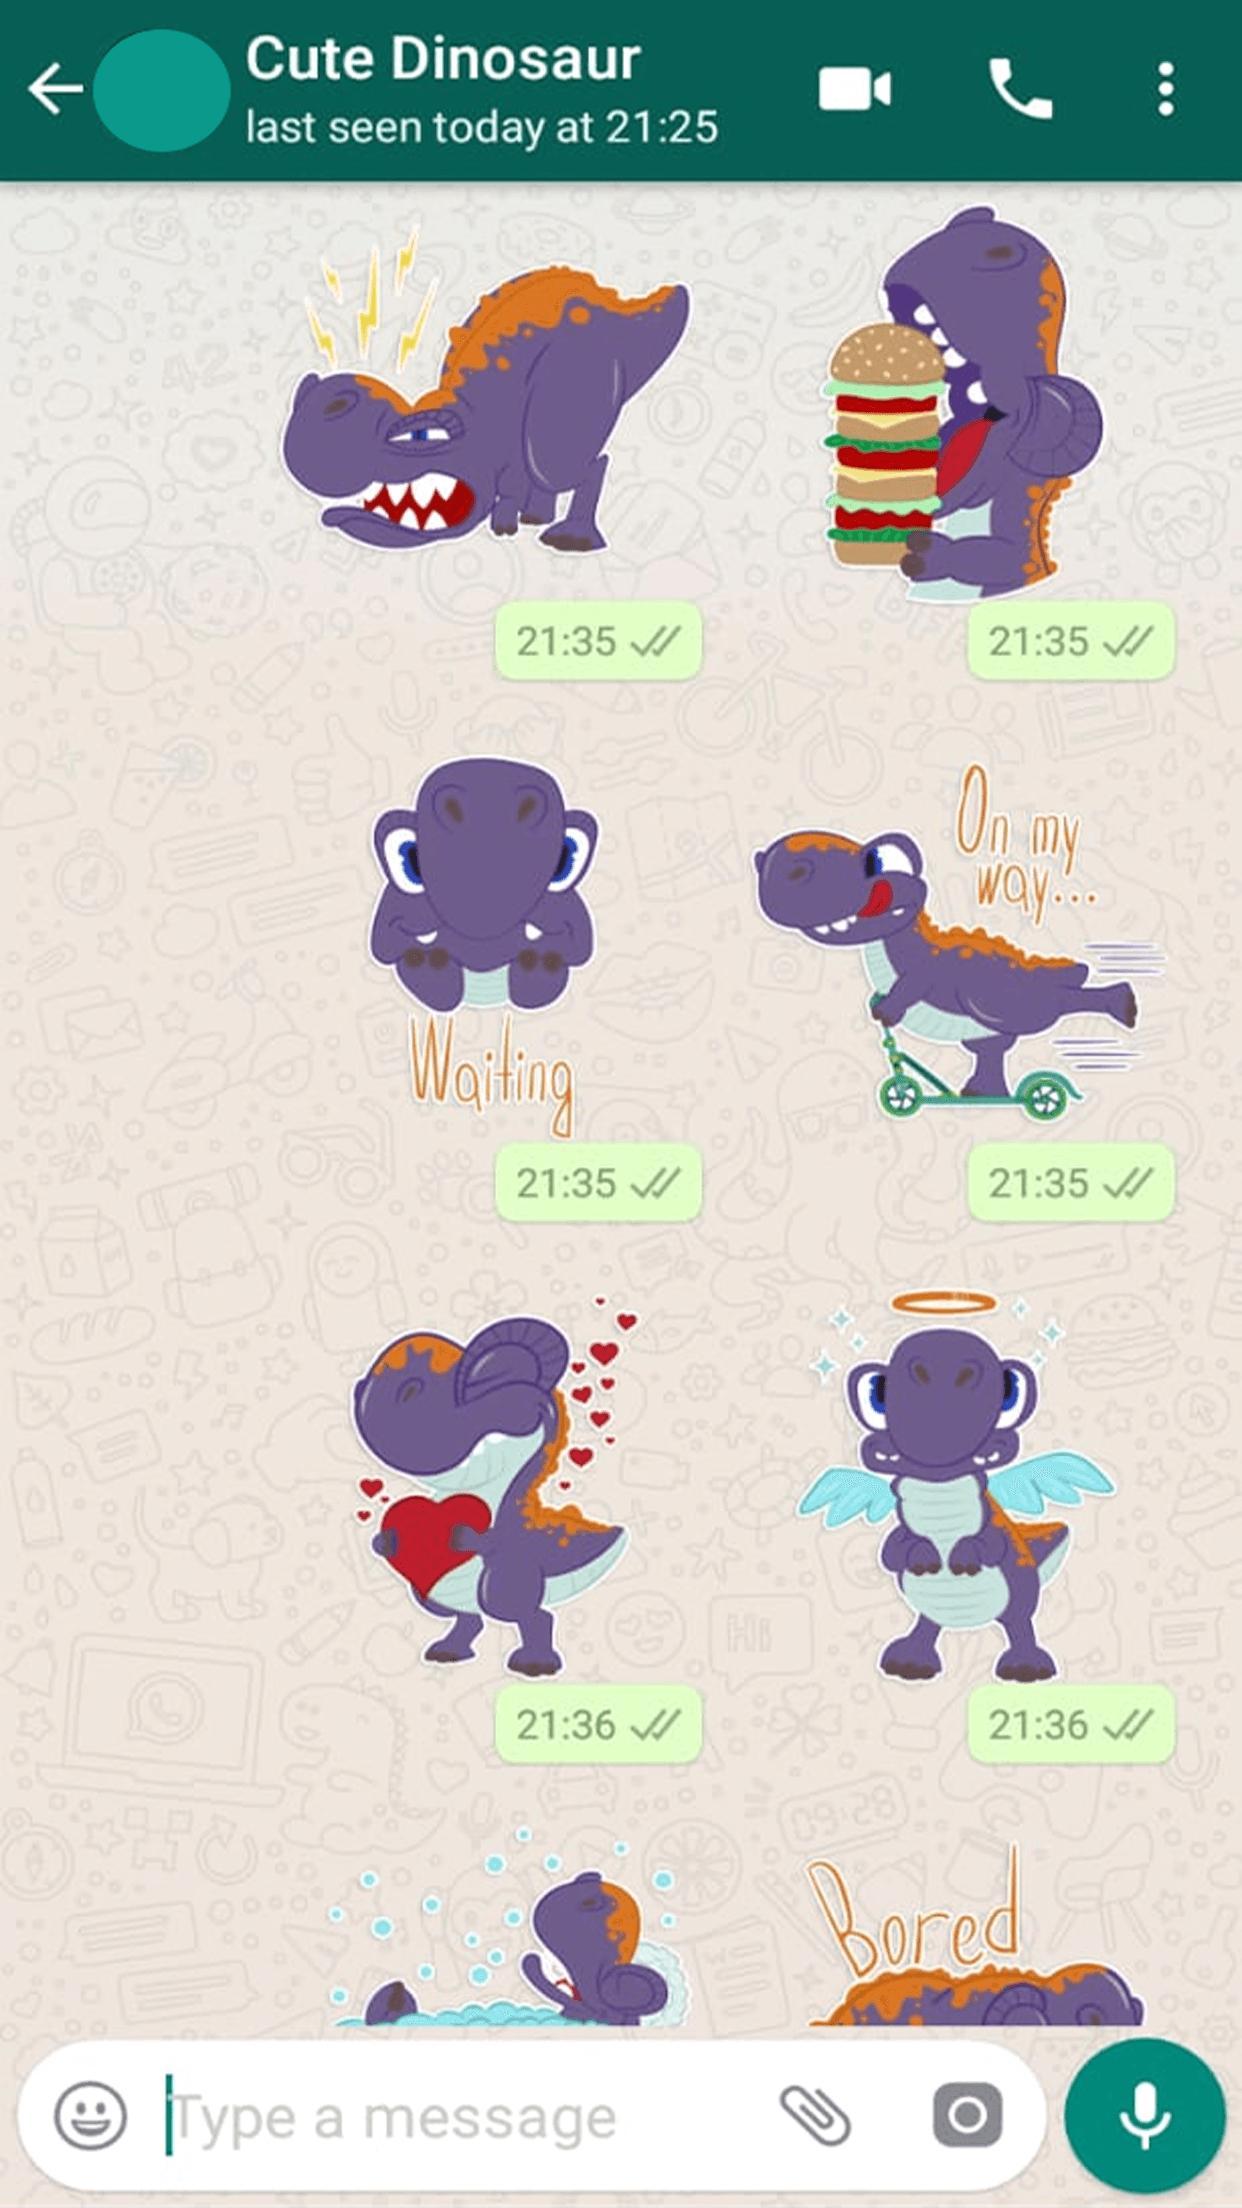 Stiker Dinosaurus Lucu Untuk Wastickerapps For Android Apk Download